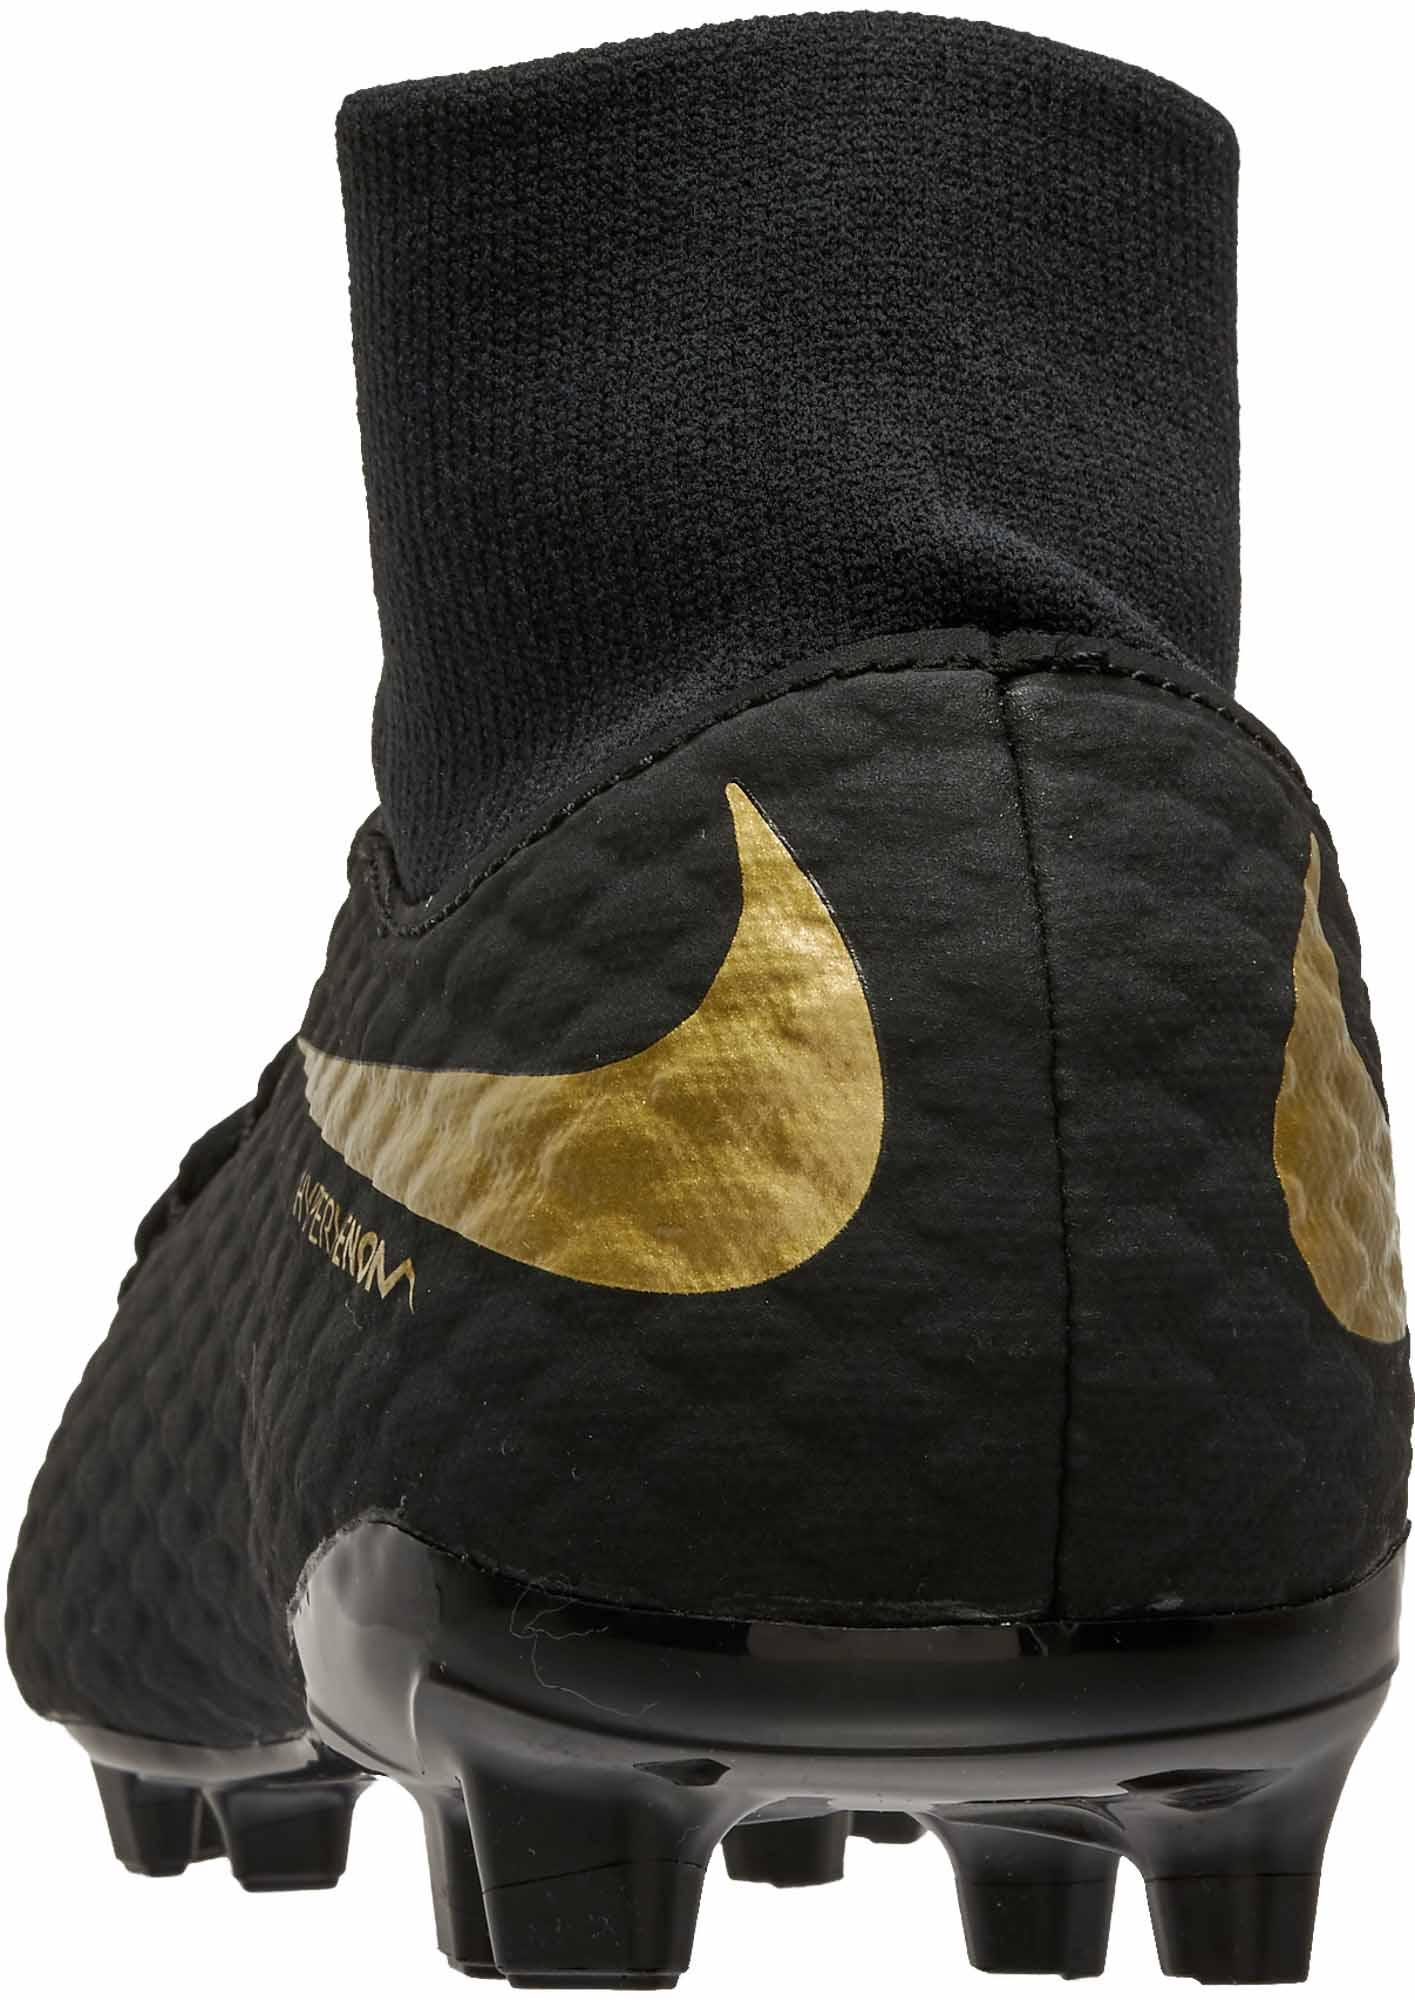 more photos 9c6f3 0bf73 Nike Hypervenom Phantom III Academy DF FG – Youth – Black Metallic Vivid  Gold